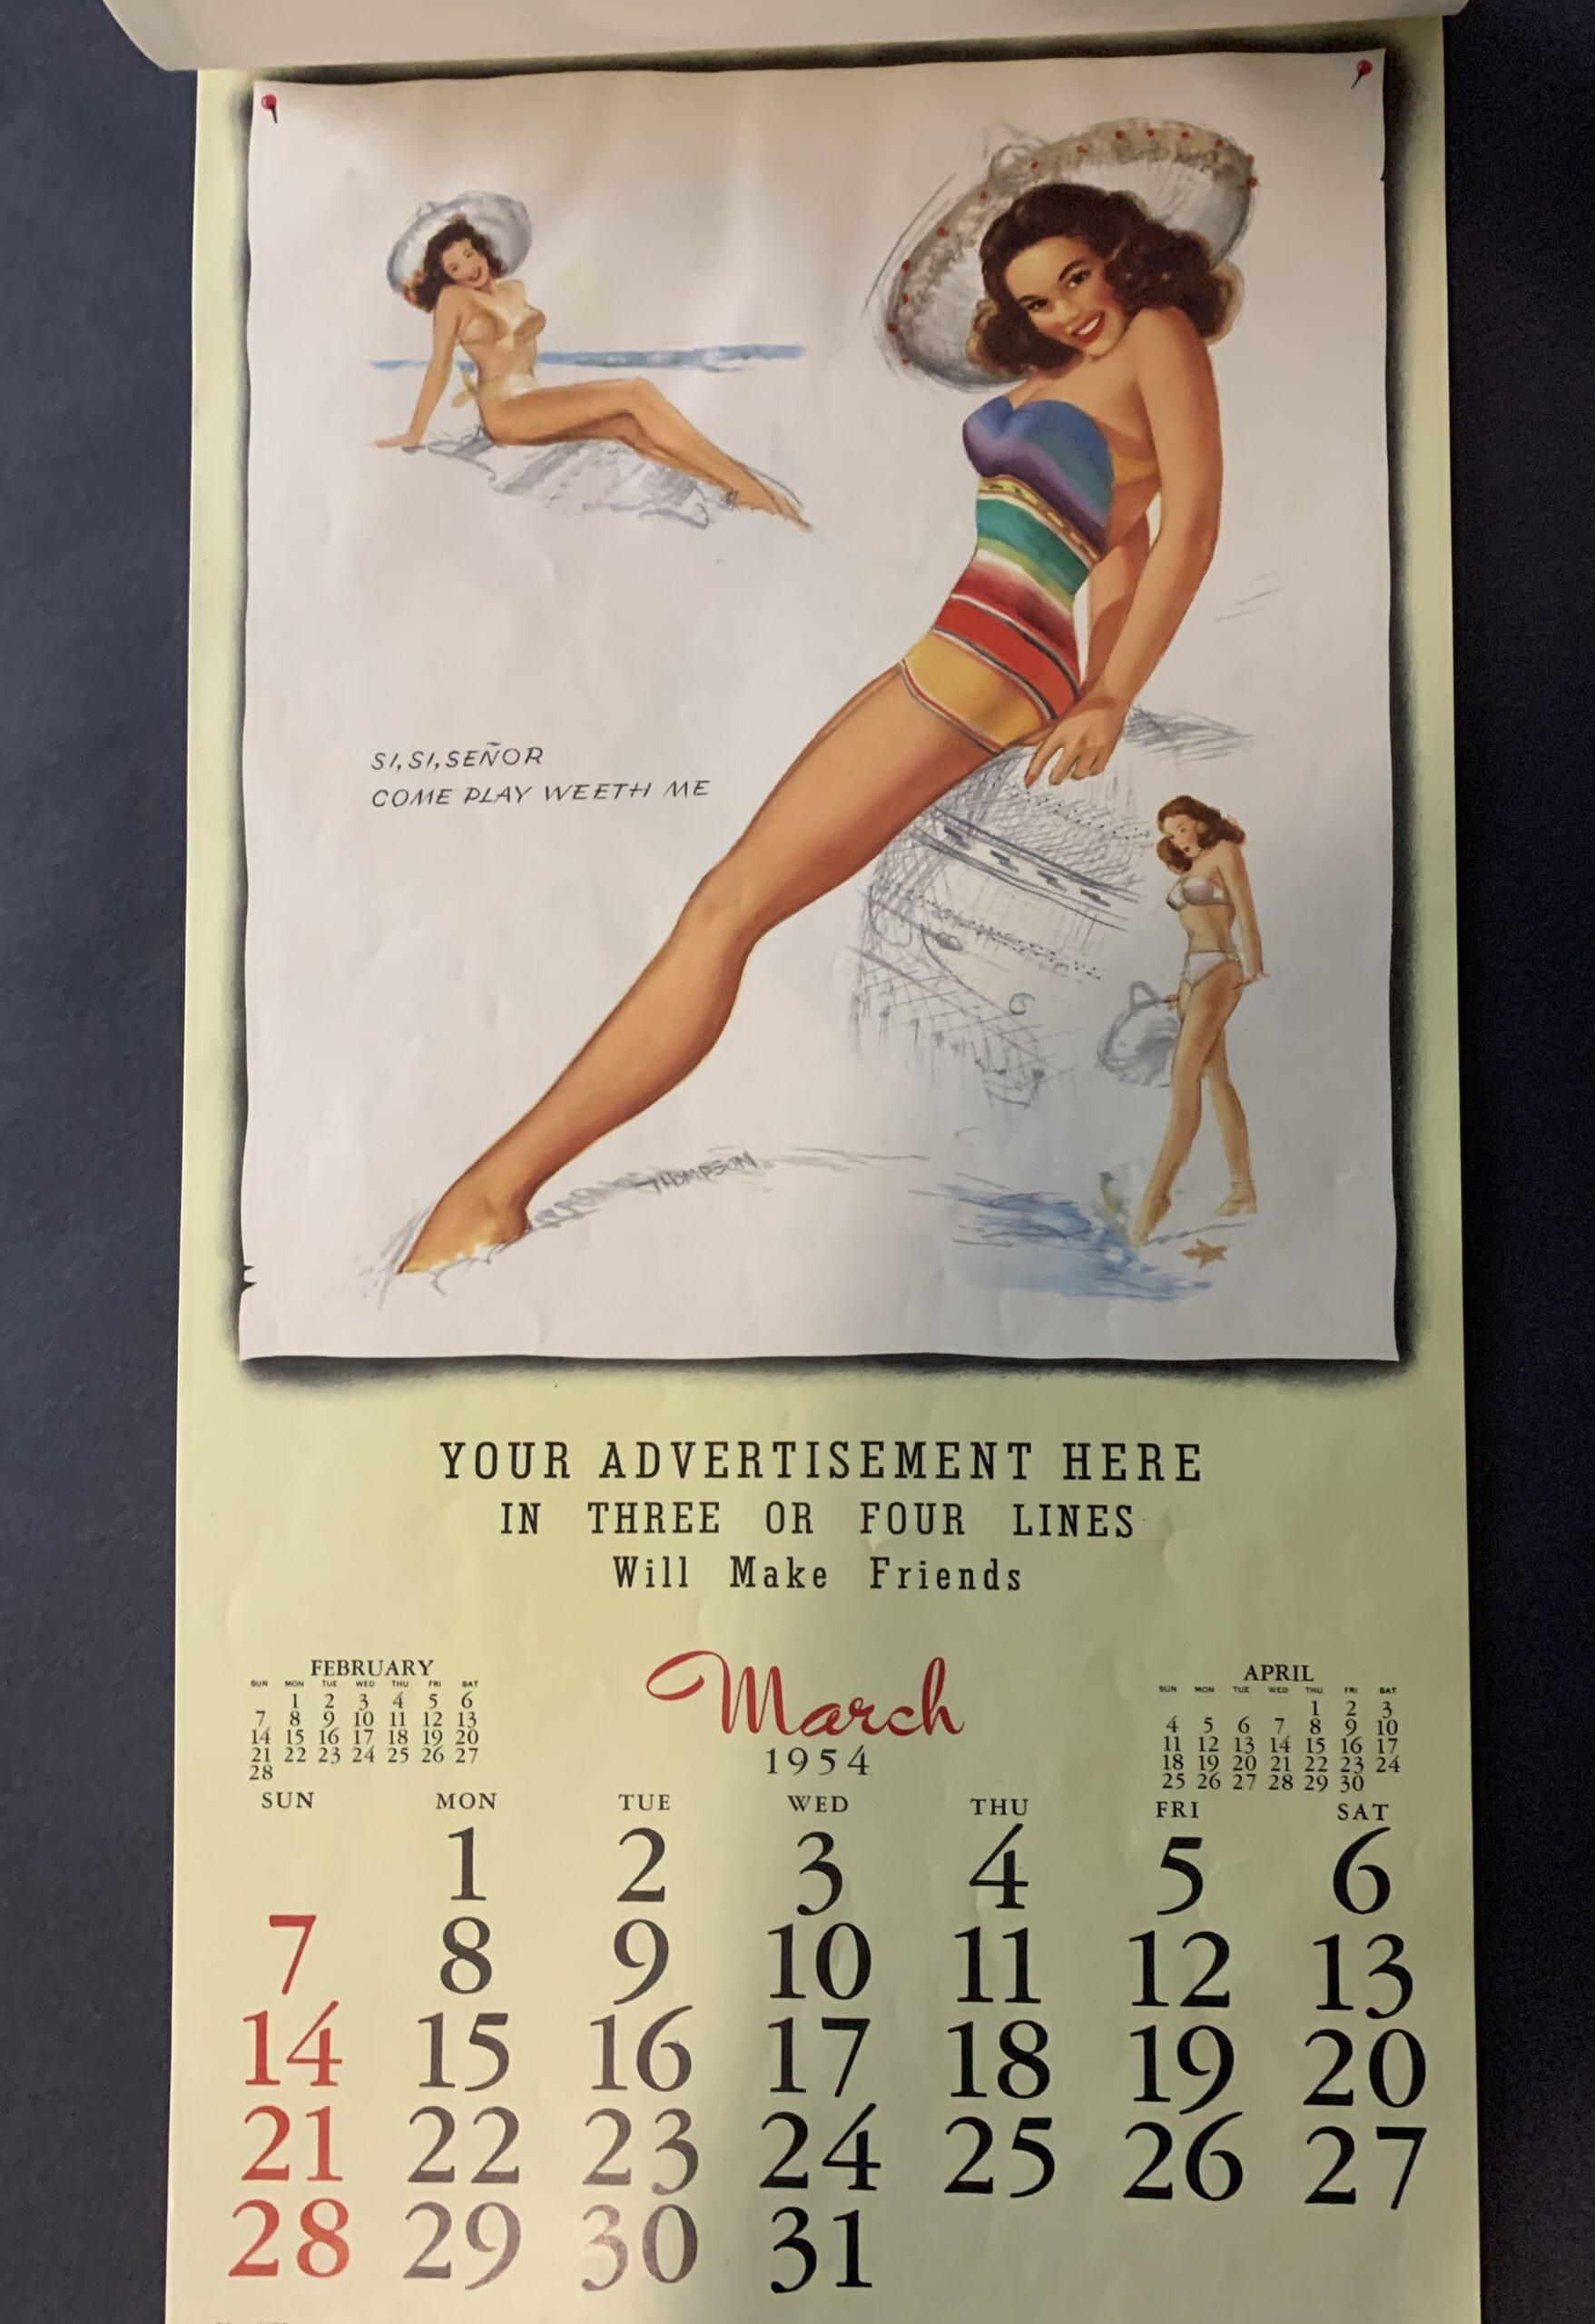 Marilyn Monroe Golden Dreams 1953/4 illustrated calendar